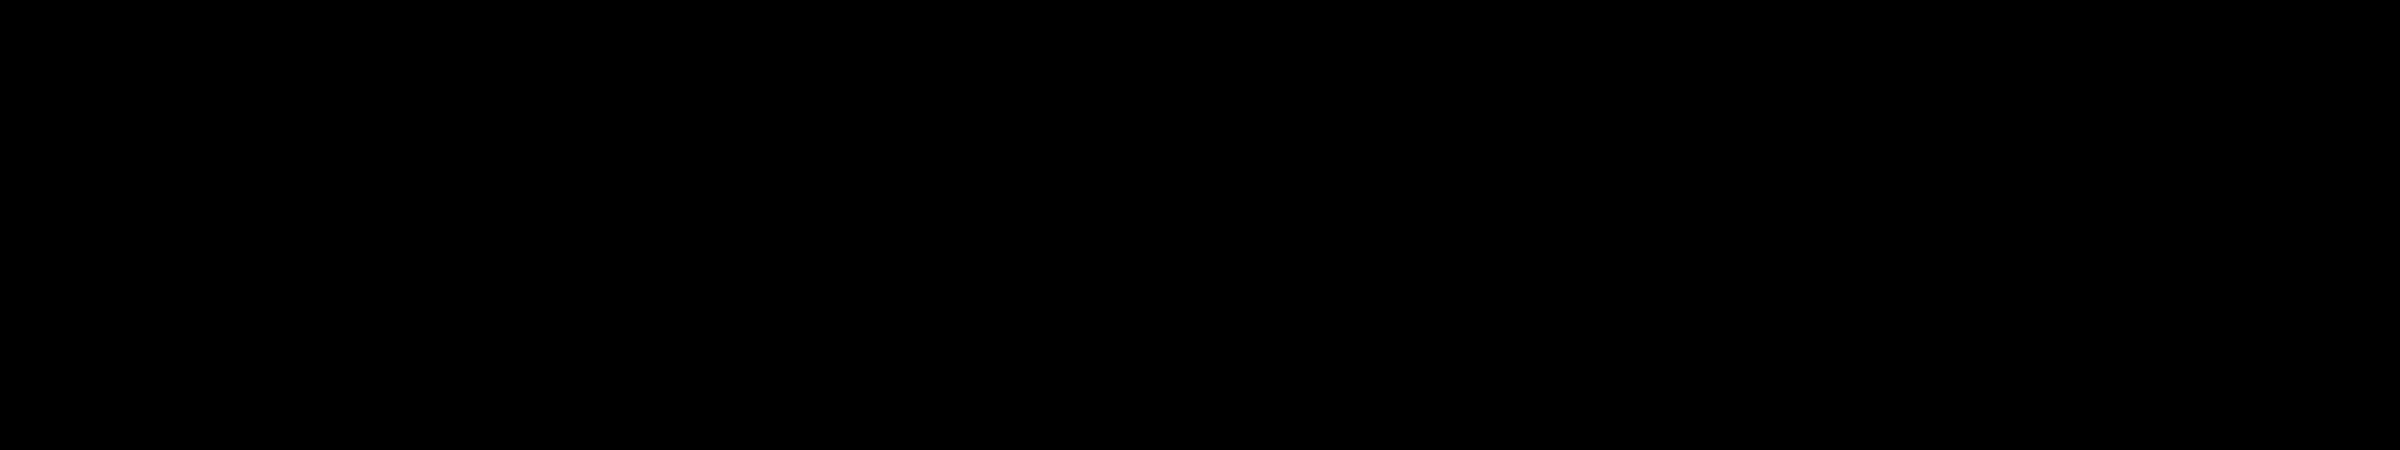 Big image png. Clipart gun silhouette